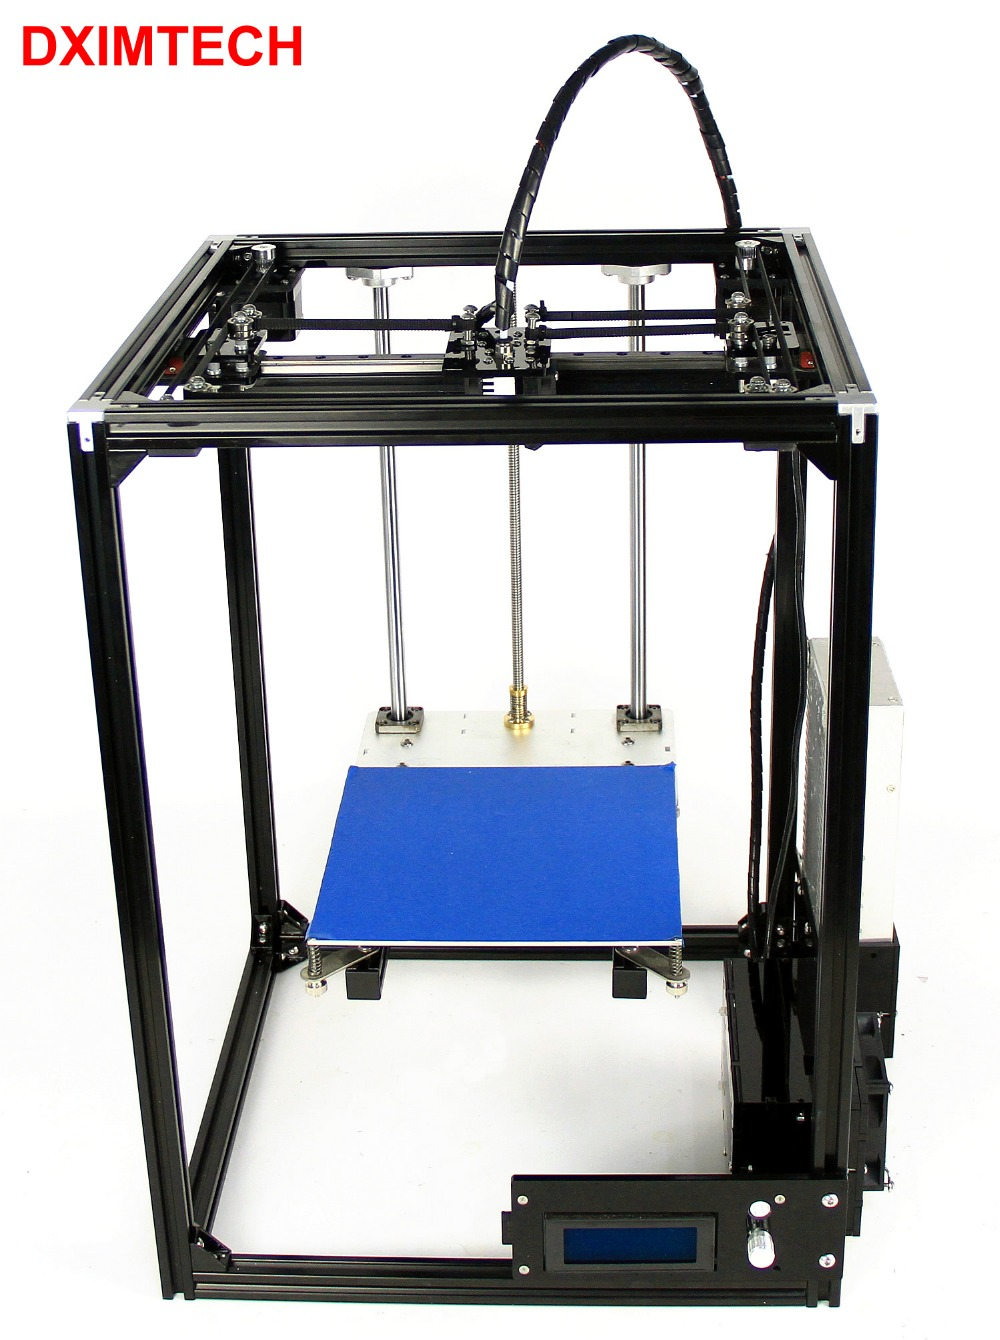 DXIMTECH CB-15 3D printer kit single big print hbot laser engraving E3D extruder 3d printing drawing robot corexy 3D printer все цены